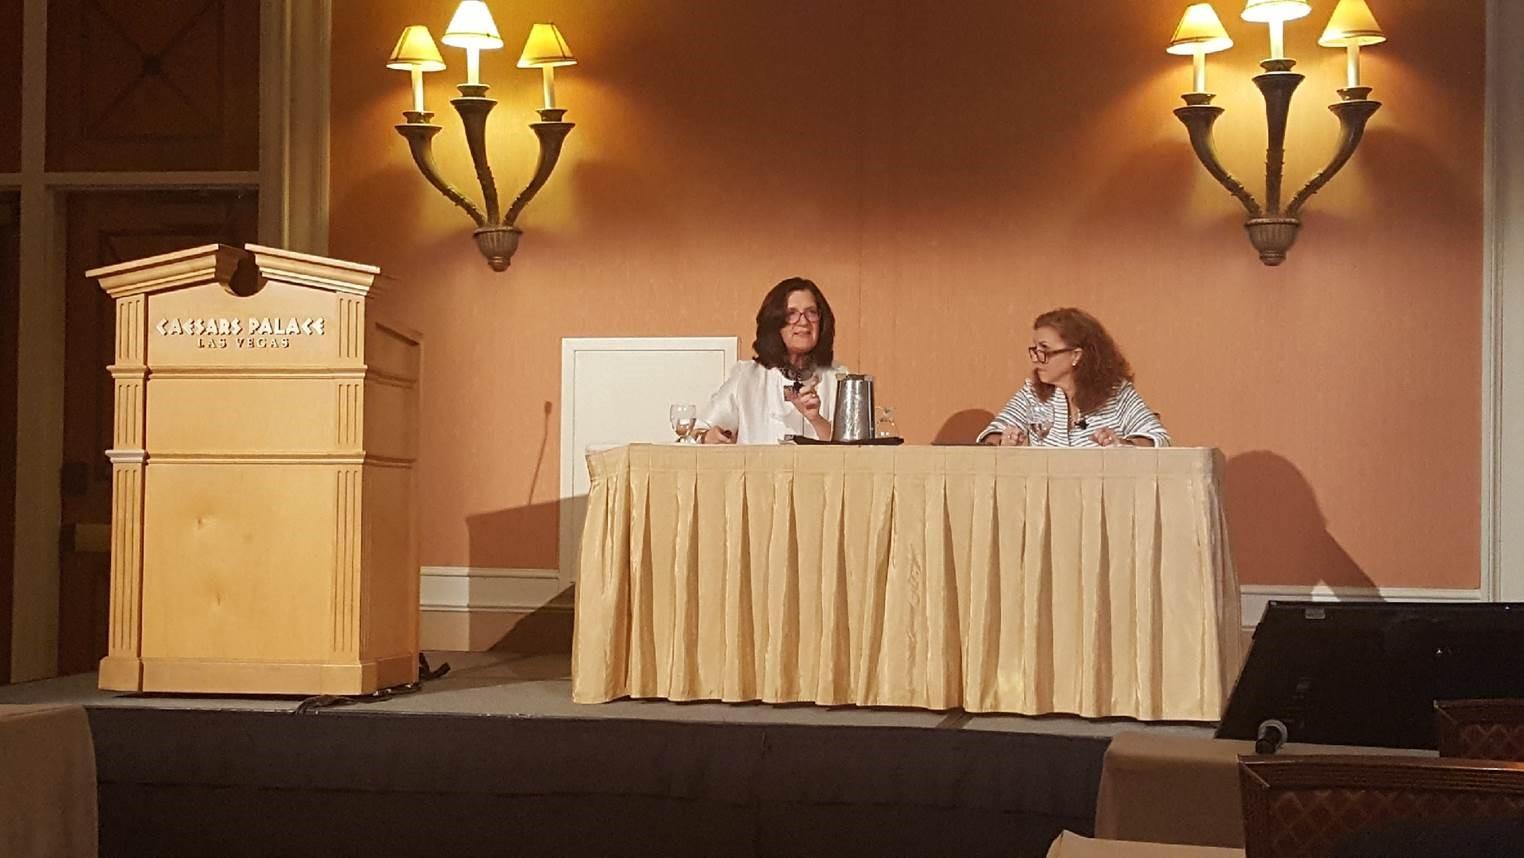 Terri Johnson speaking at AICPA Auto Dealership Conference